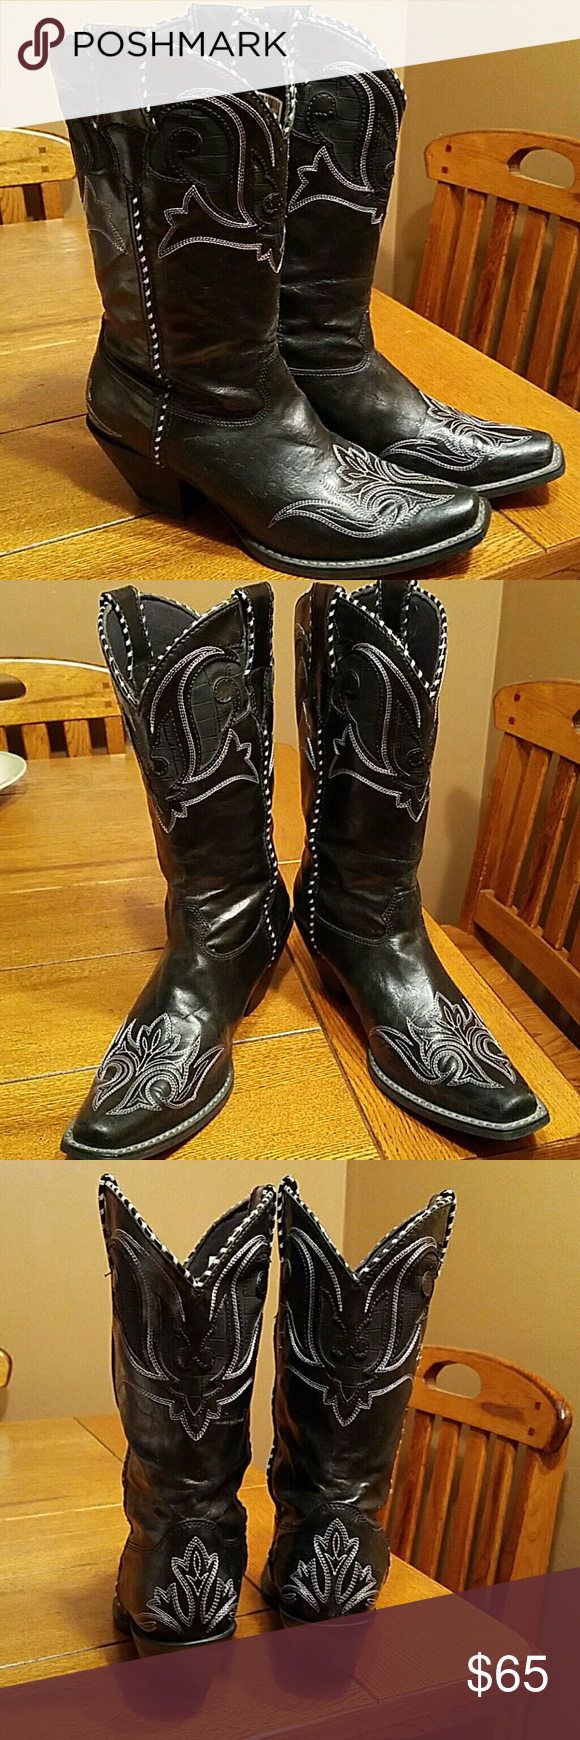 Spotted while shopping on Poshmark: ⚘SOLD⚘Durango Womens Leather Boots Size 8m! #poshmark #fashion #shopping #style #Durango #Shoes